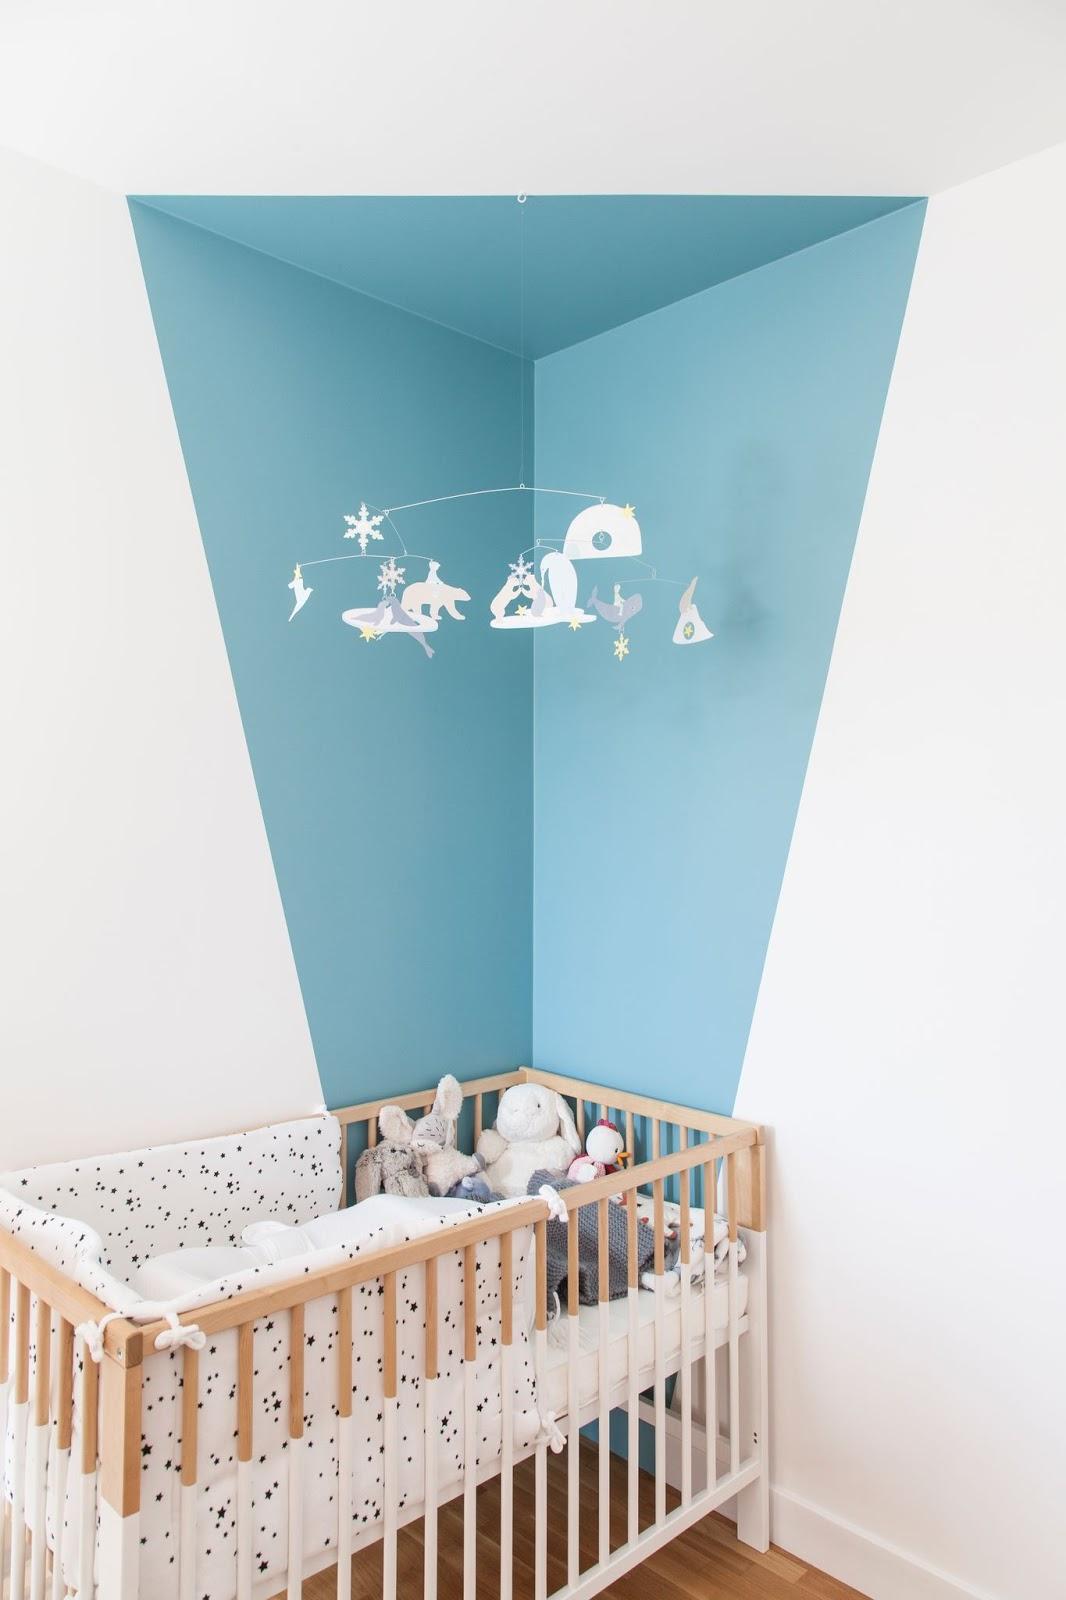 quarto infantil parede pintura geométrica